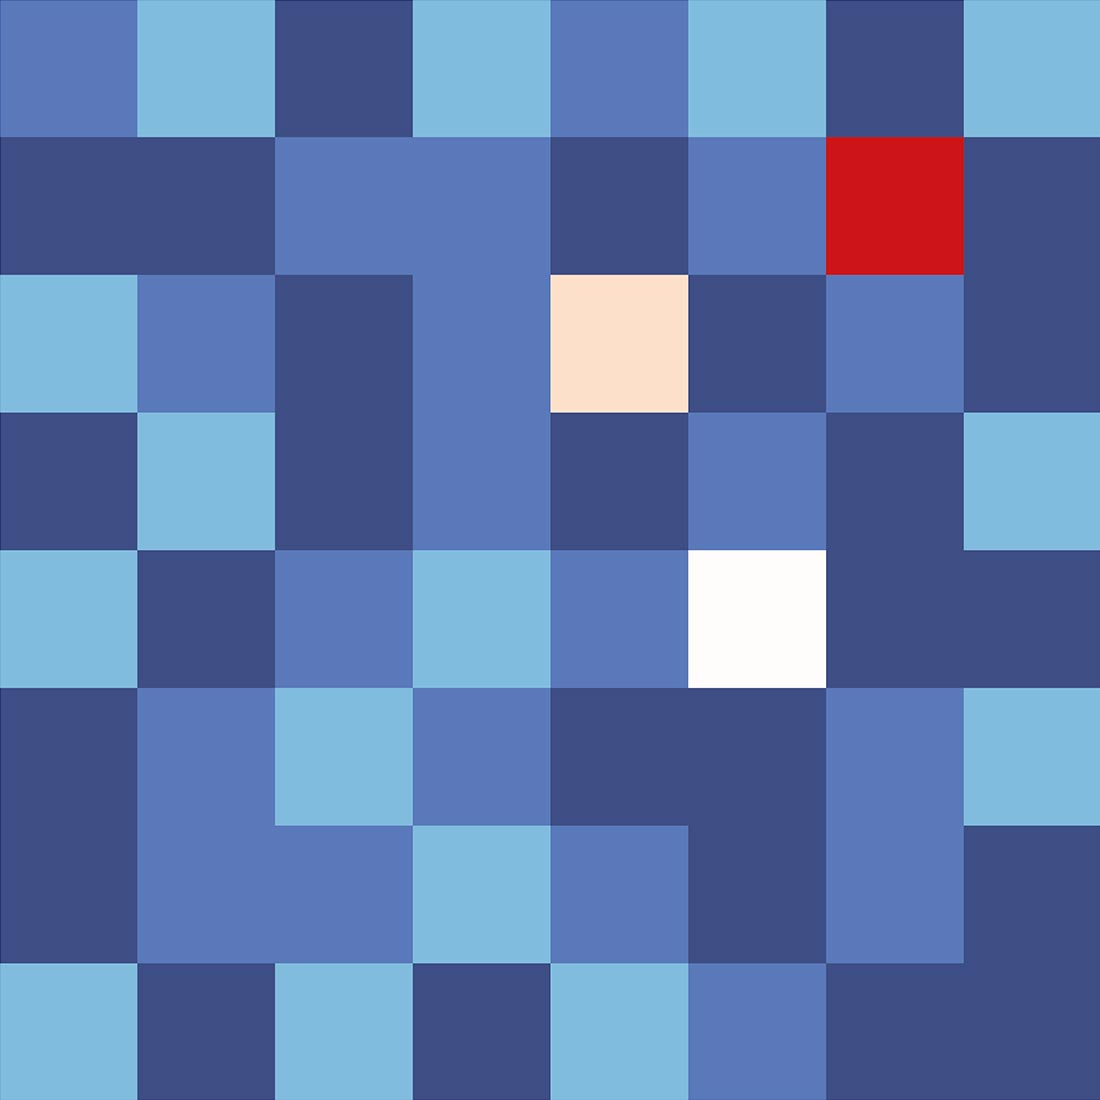 scrambled-videogame-charakters_09